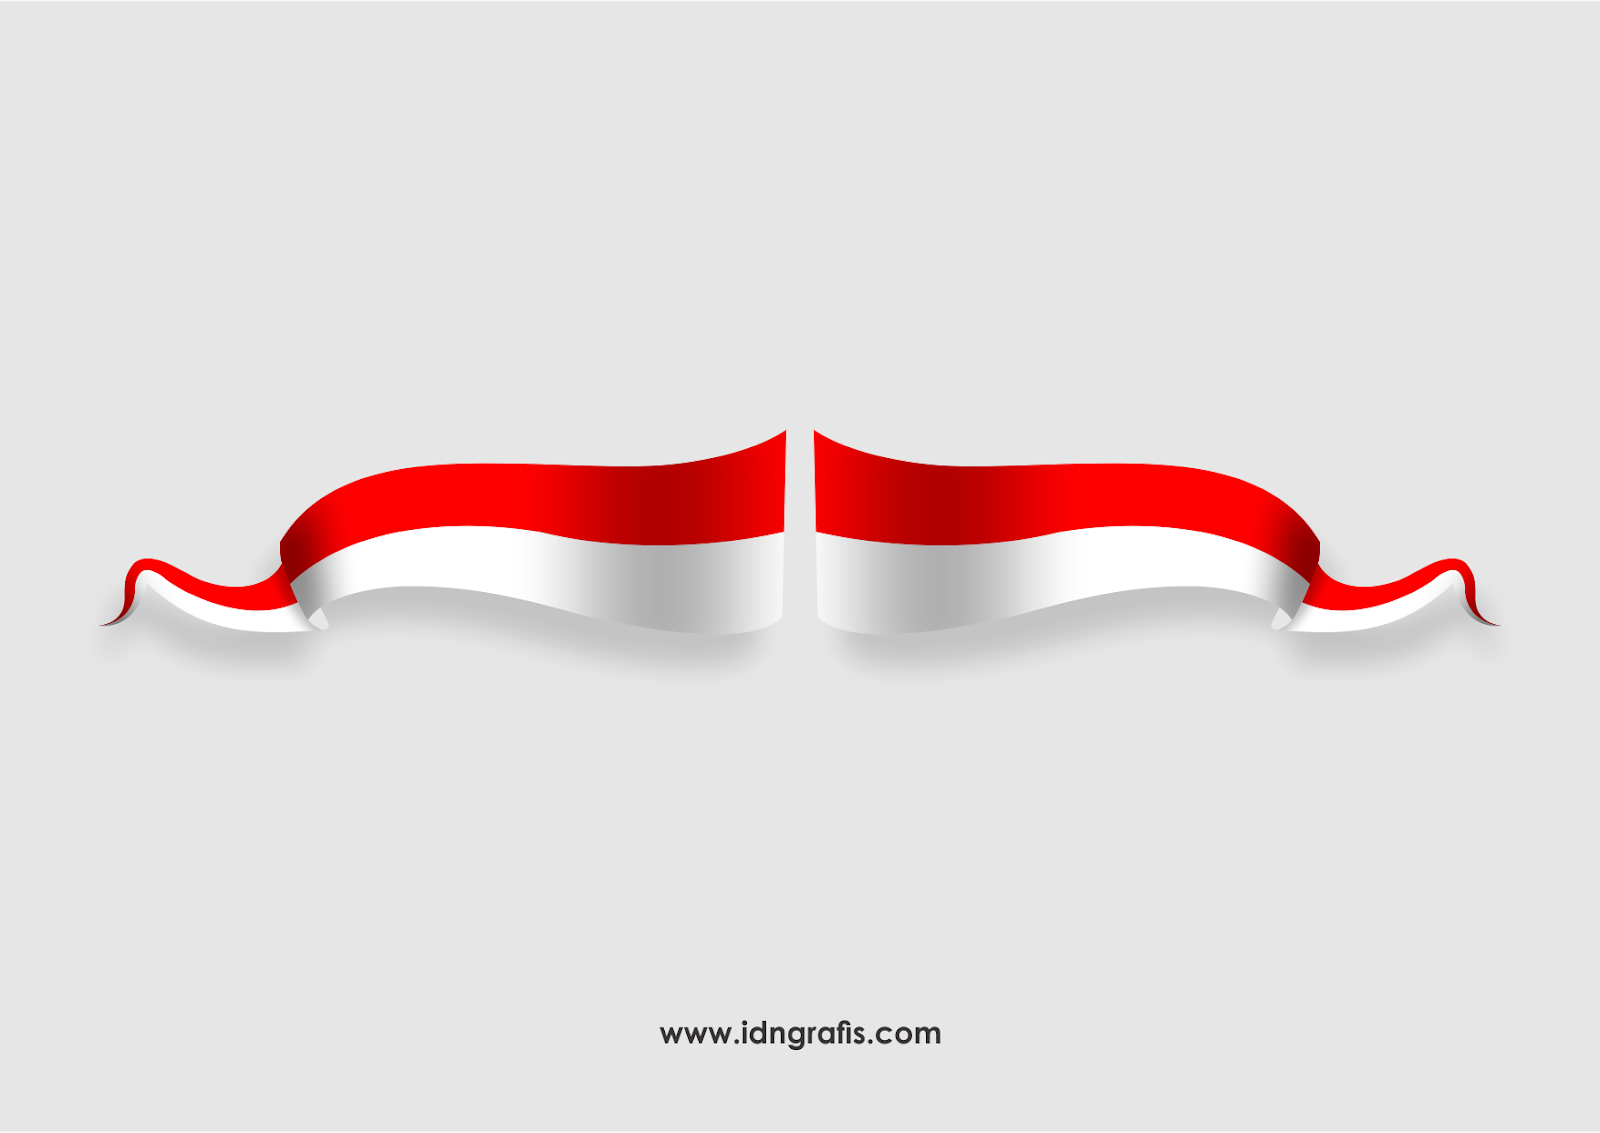 500 Gambar Bendera Merah Putih Vector Hd Infobaru